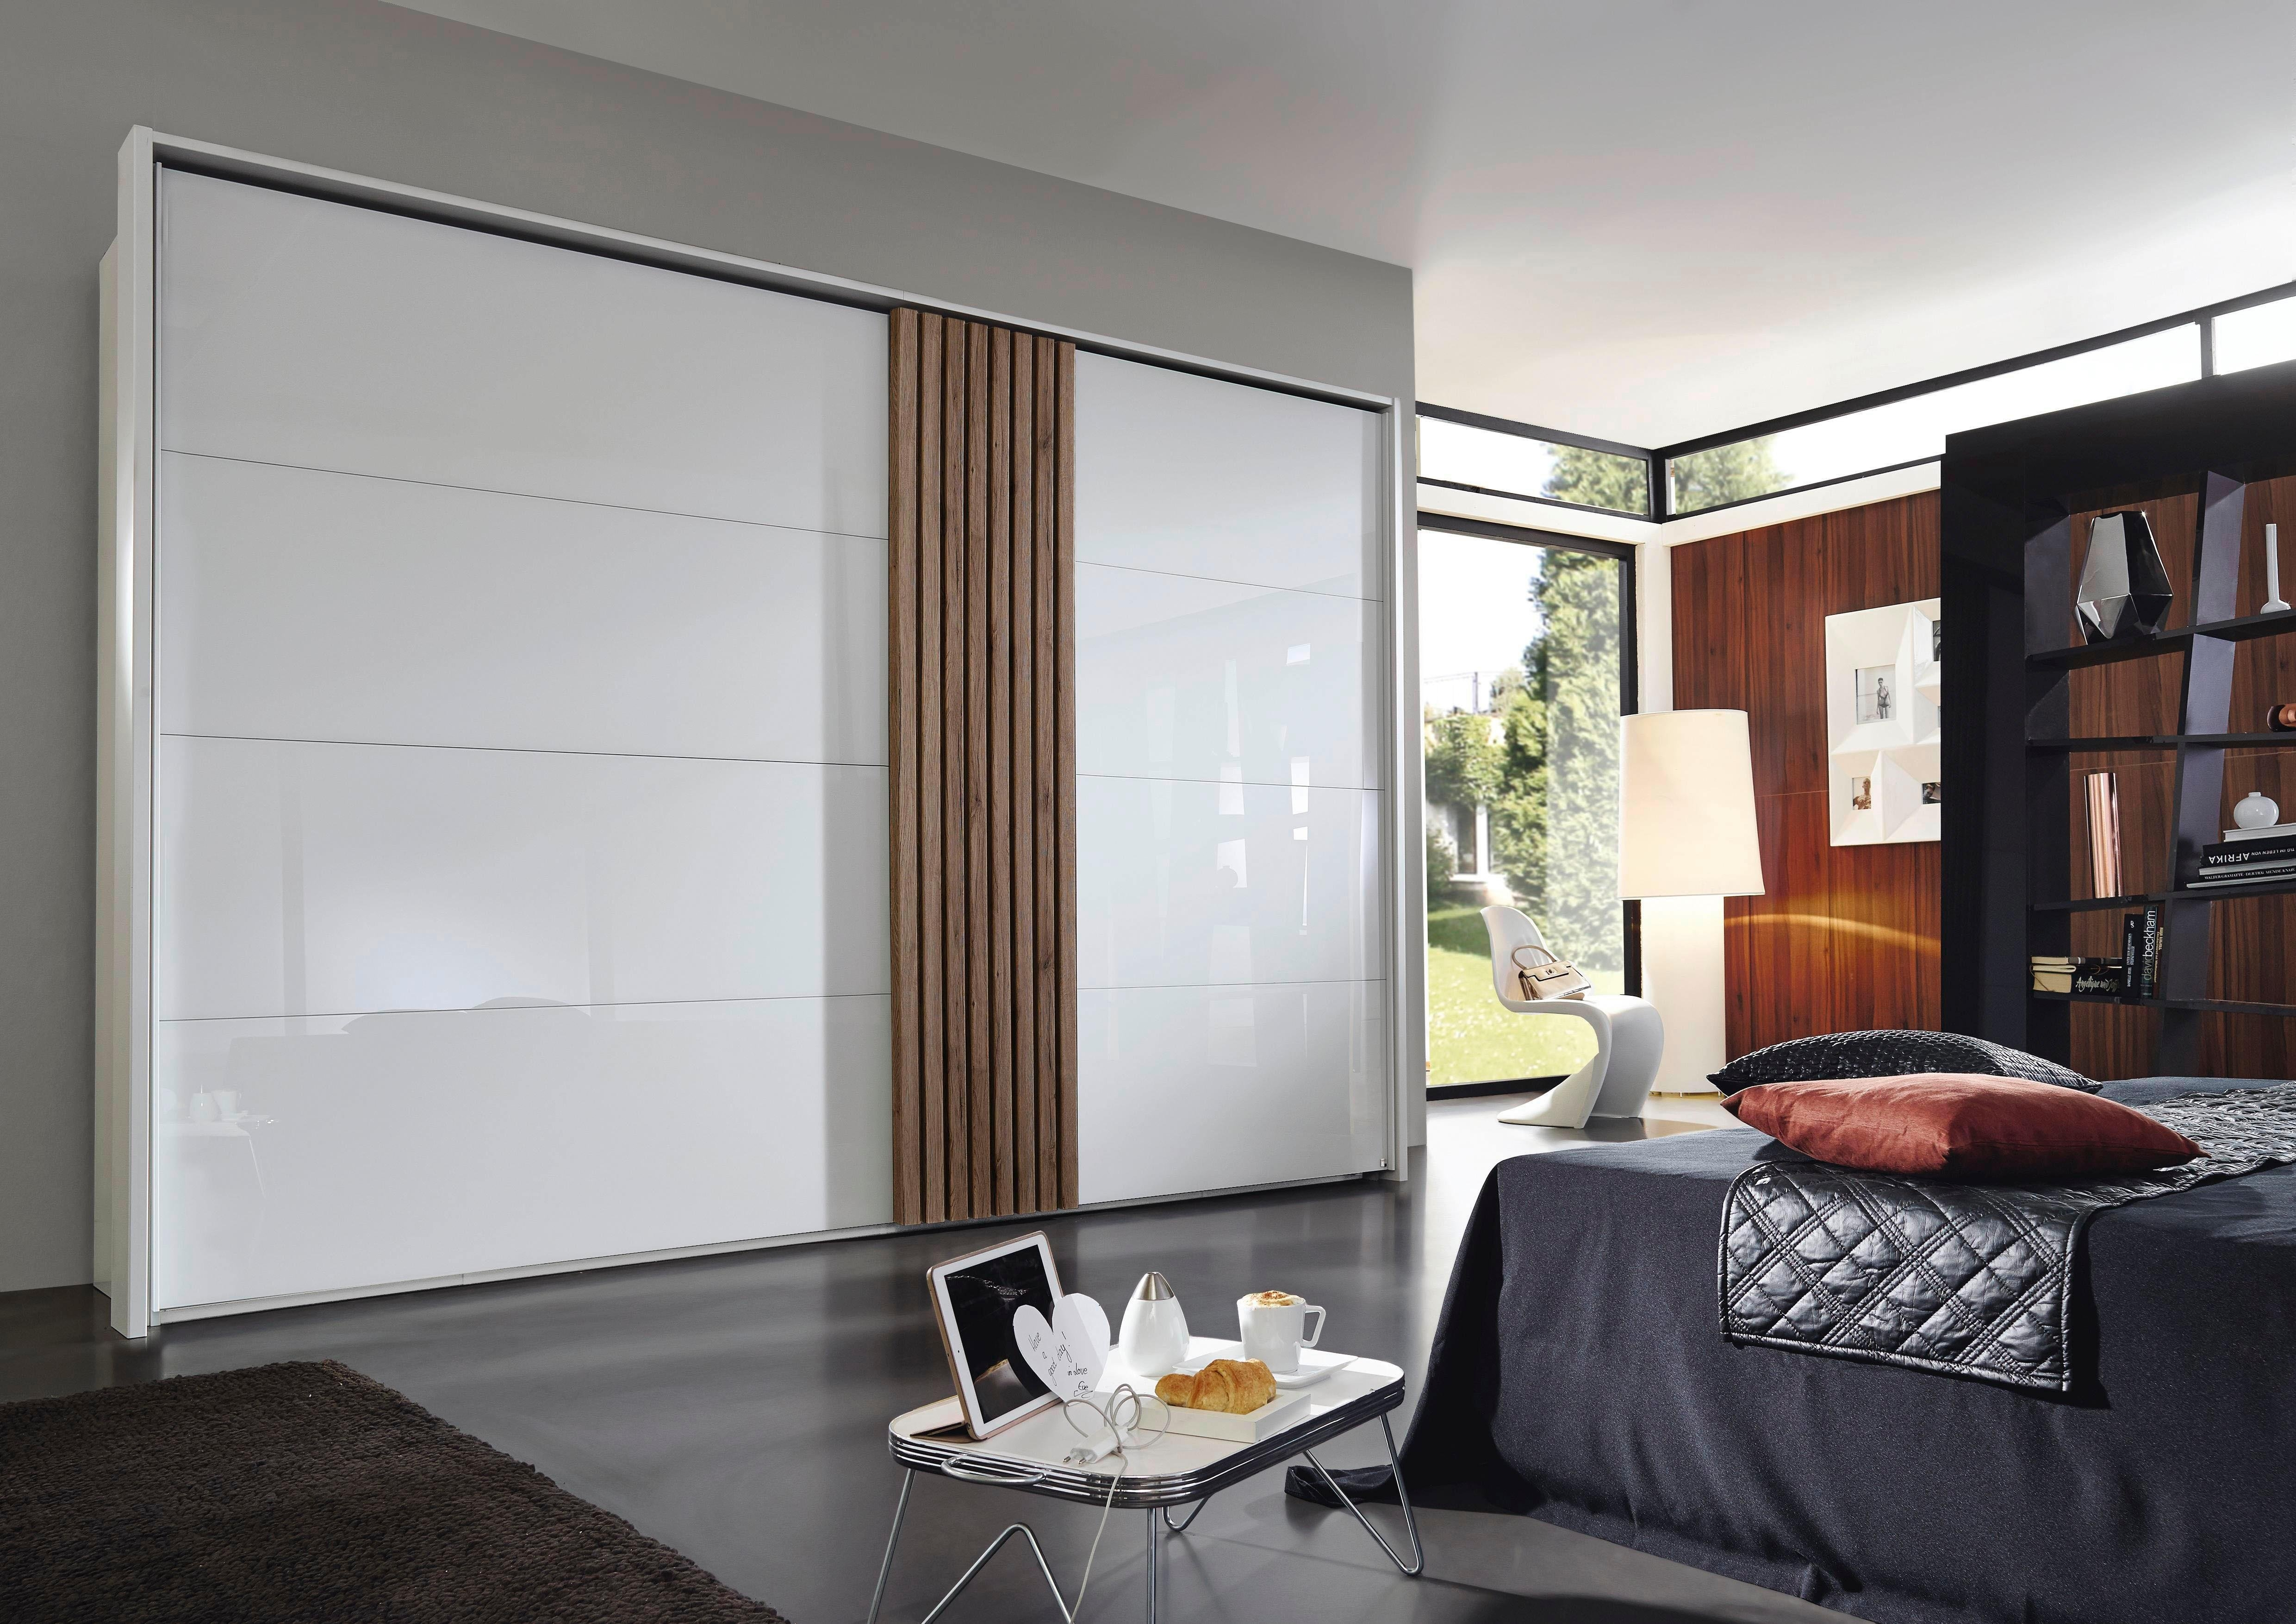 rauch BLACK Zweefdeurkast Tegio met houtdecorafwerking voordelig en veilig online kopen